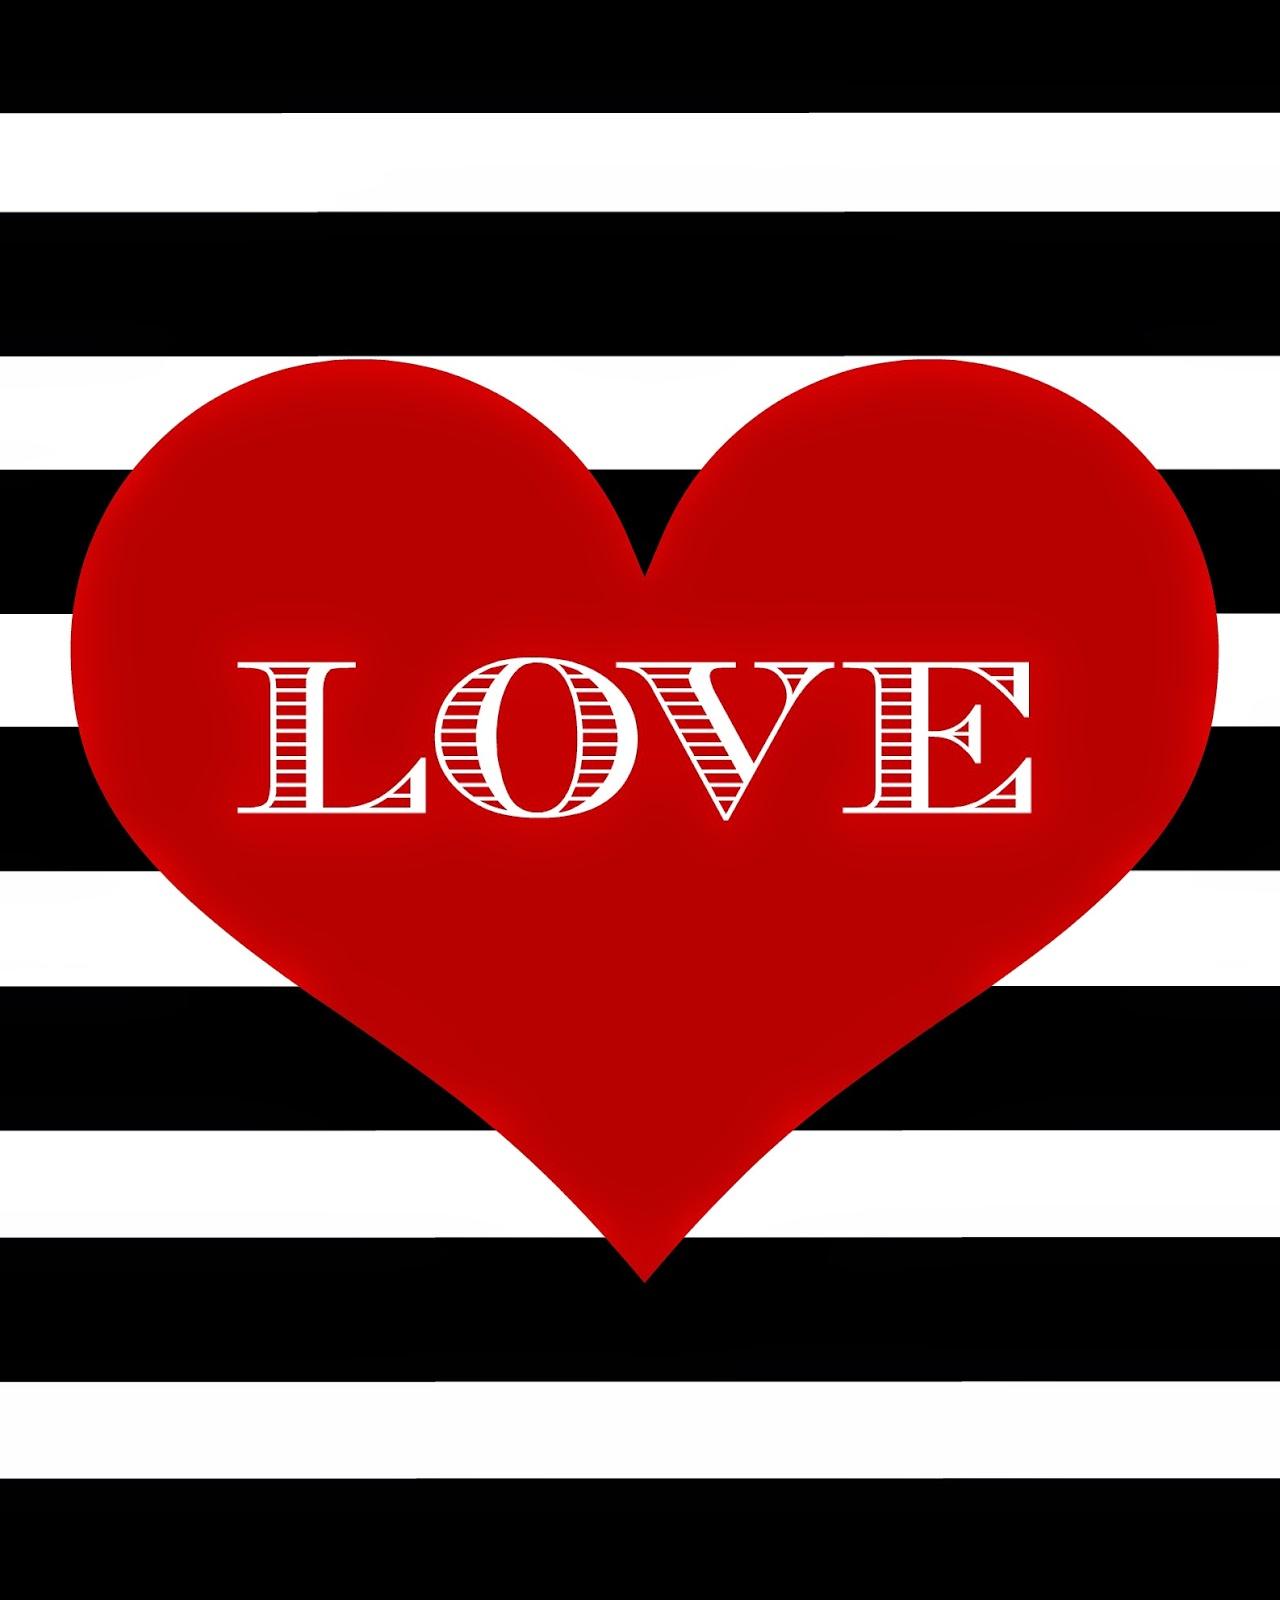 Légend image in printable valentine heart